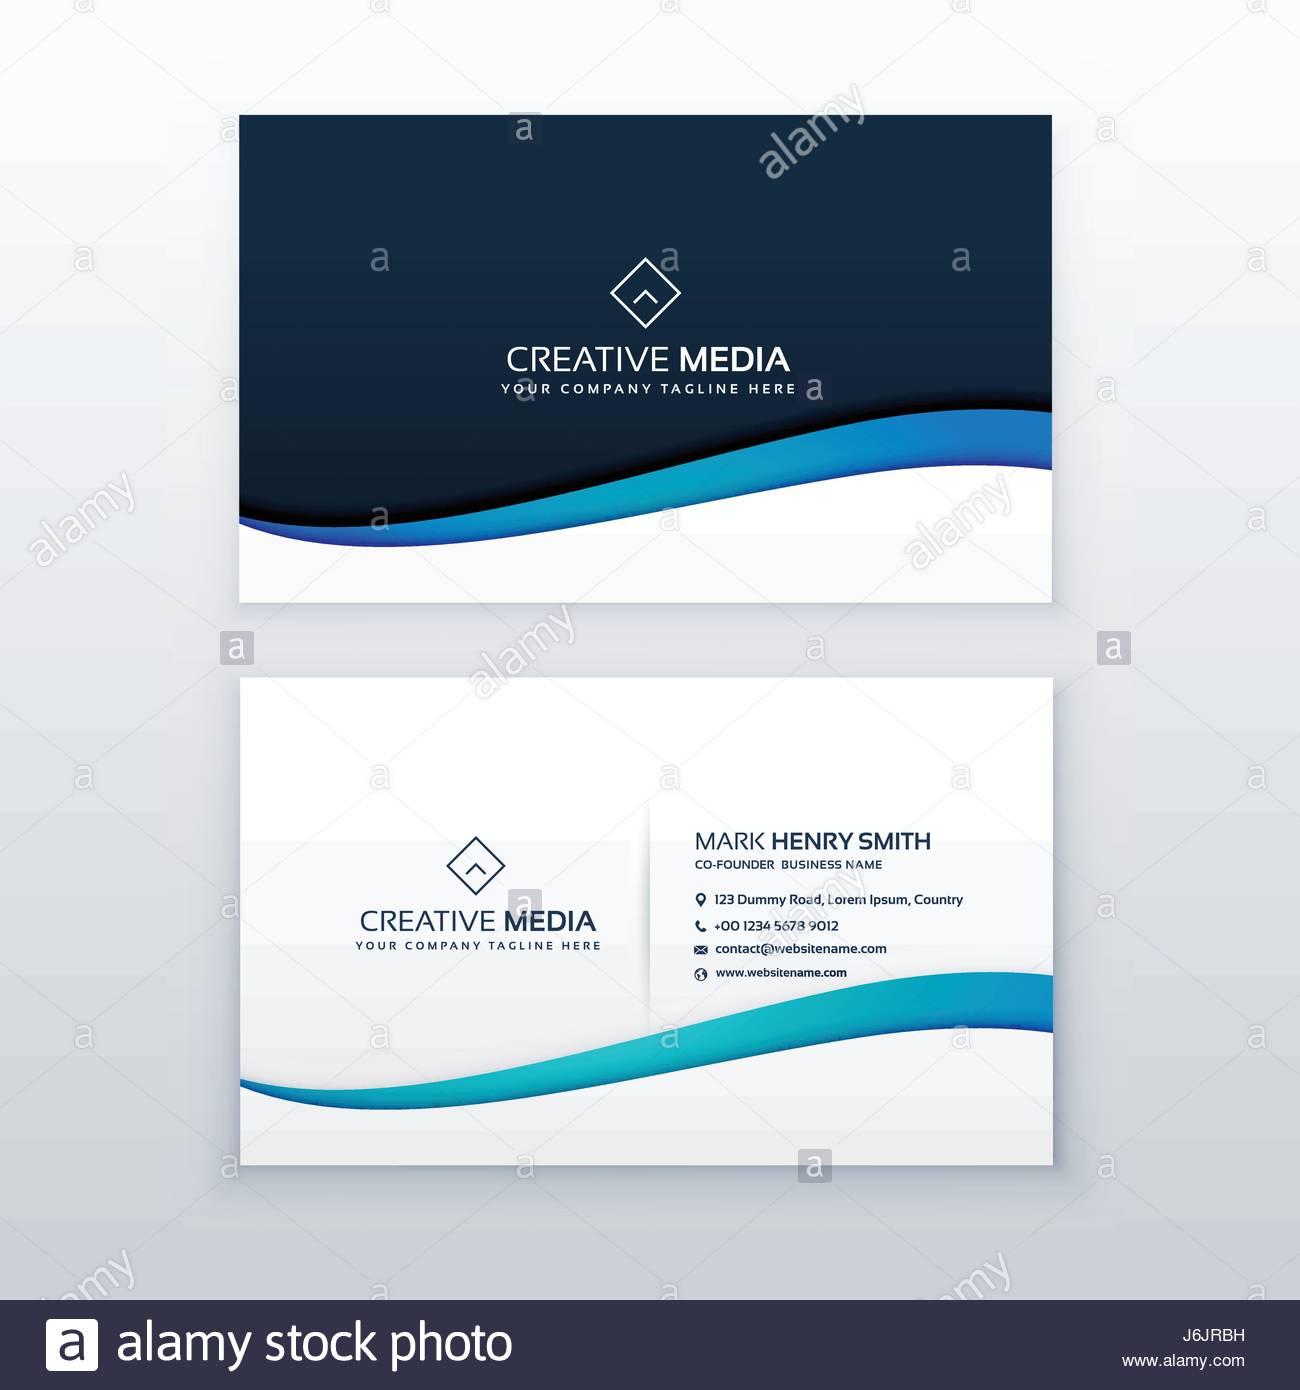 Clean blue wave business card design template stock vector art clean blue wave business card design template colourmoves